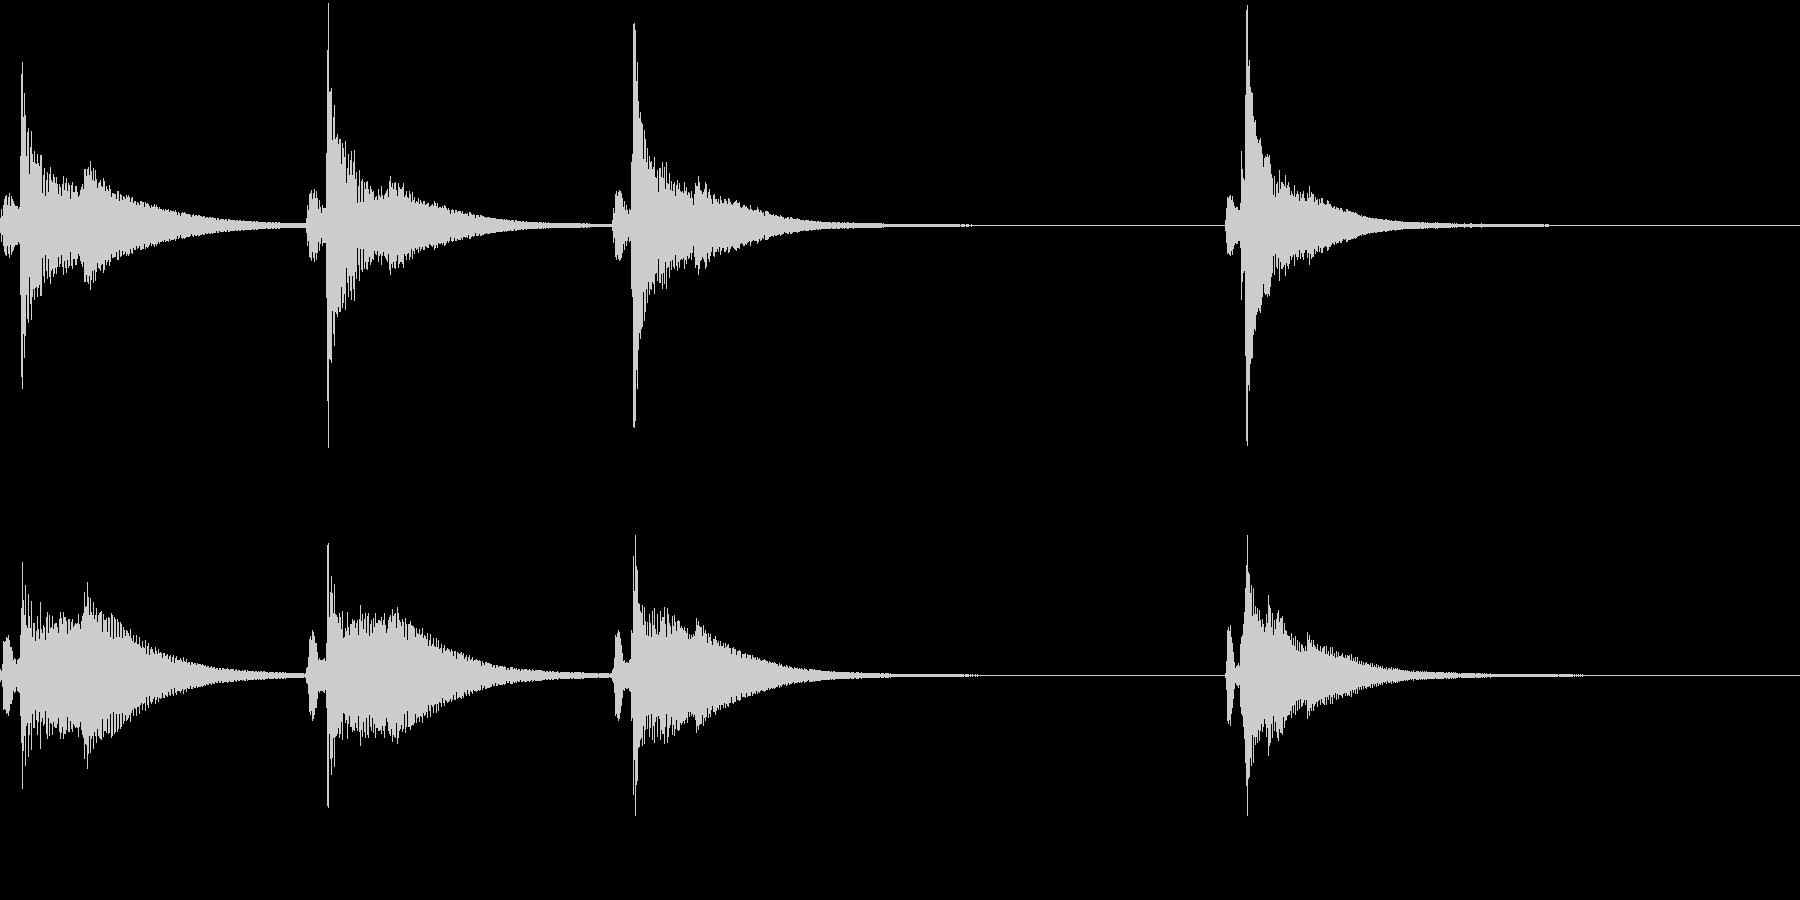 Kawaii メルヘンな受信・通知音 3の未再生の波形